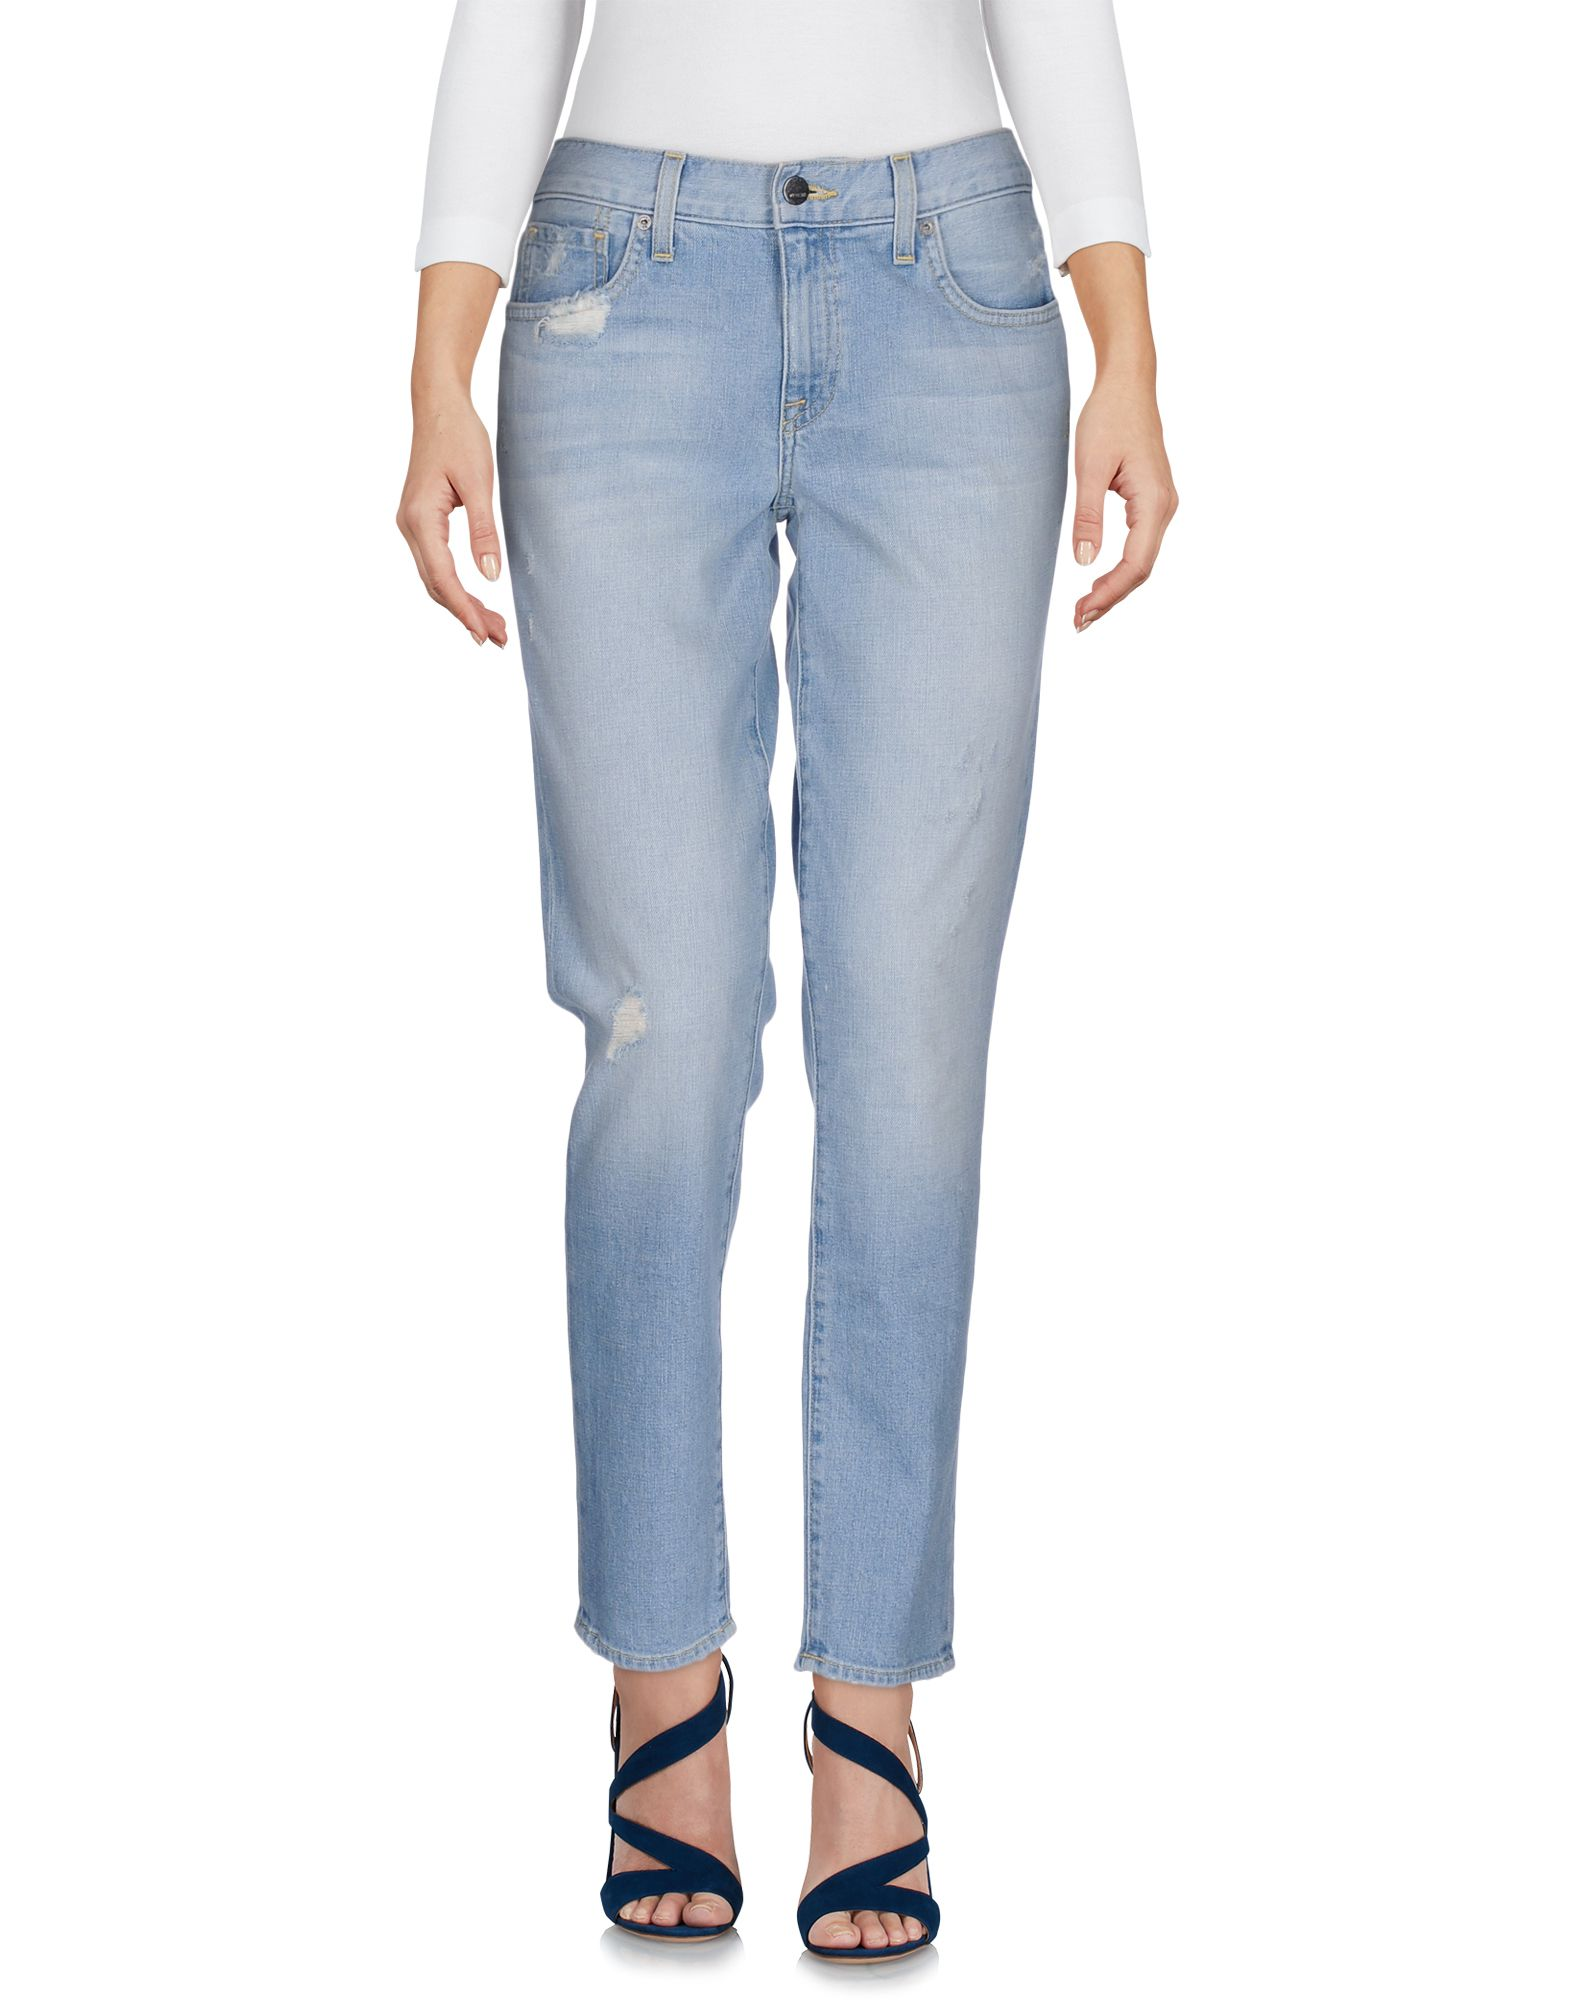 GENETIC DENIM Denim Pants in Blue